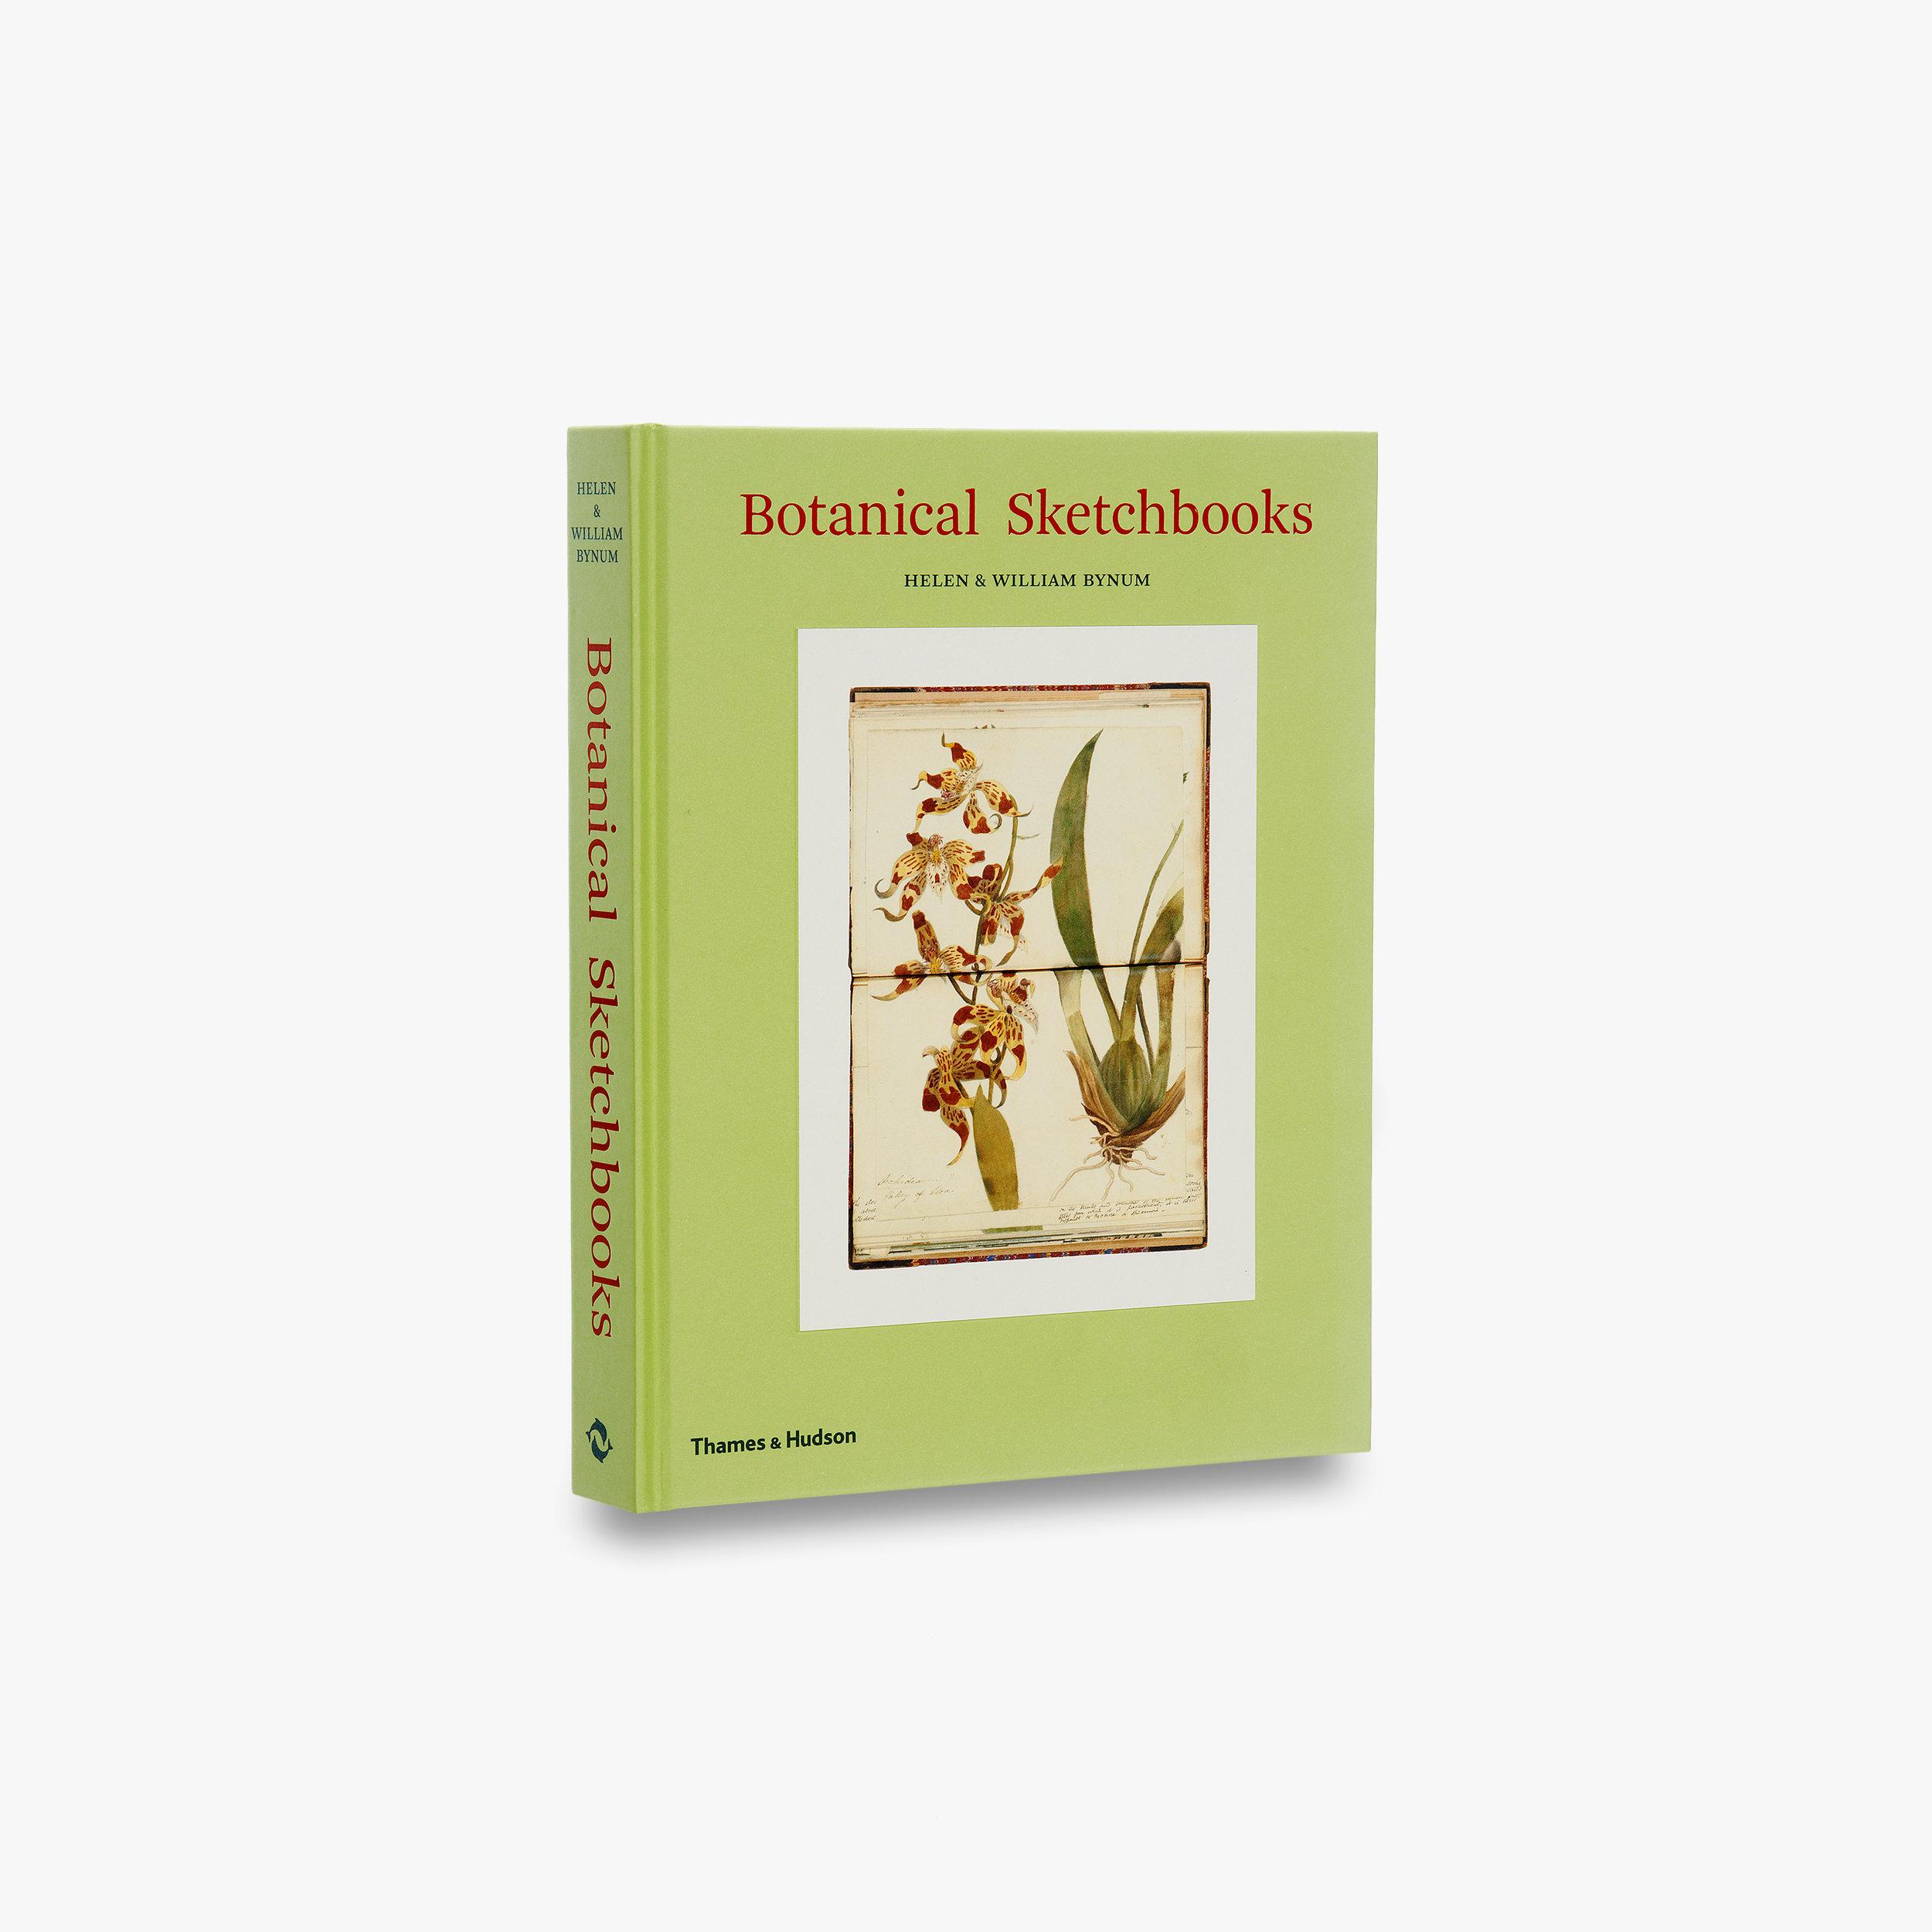 9780500518816_botanical_sketchbooks.jpg